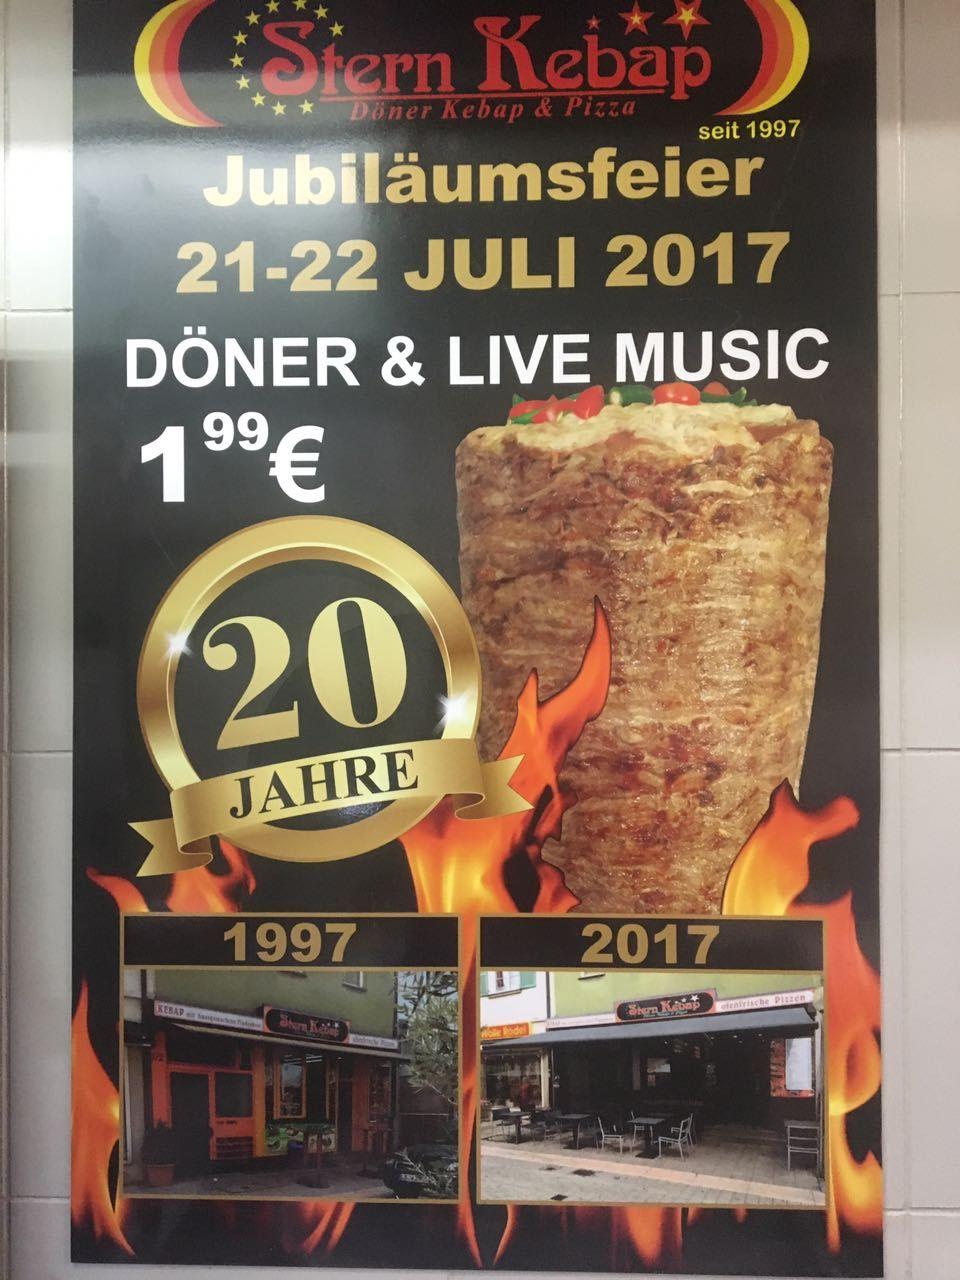 20Jahre Stern Kebap Ludwigsburg Jubiläum